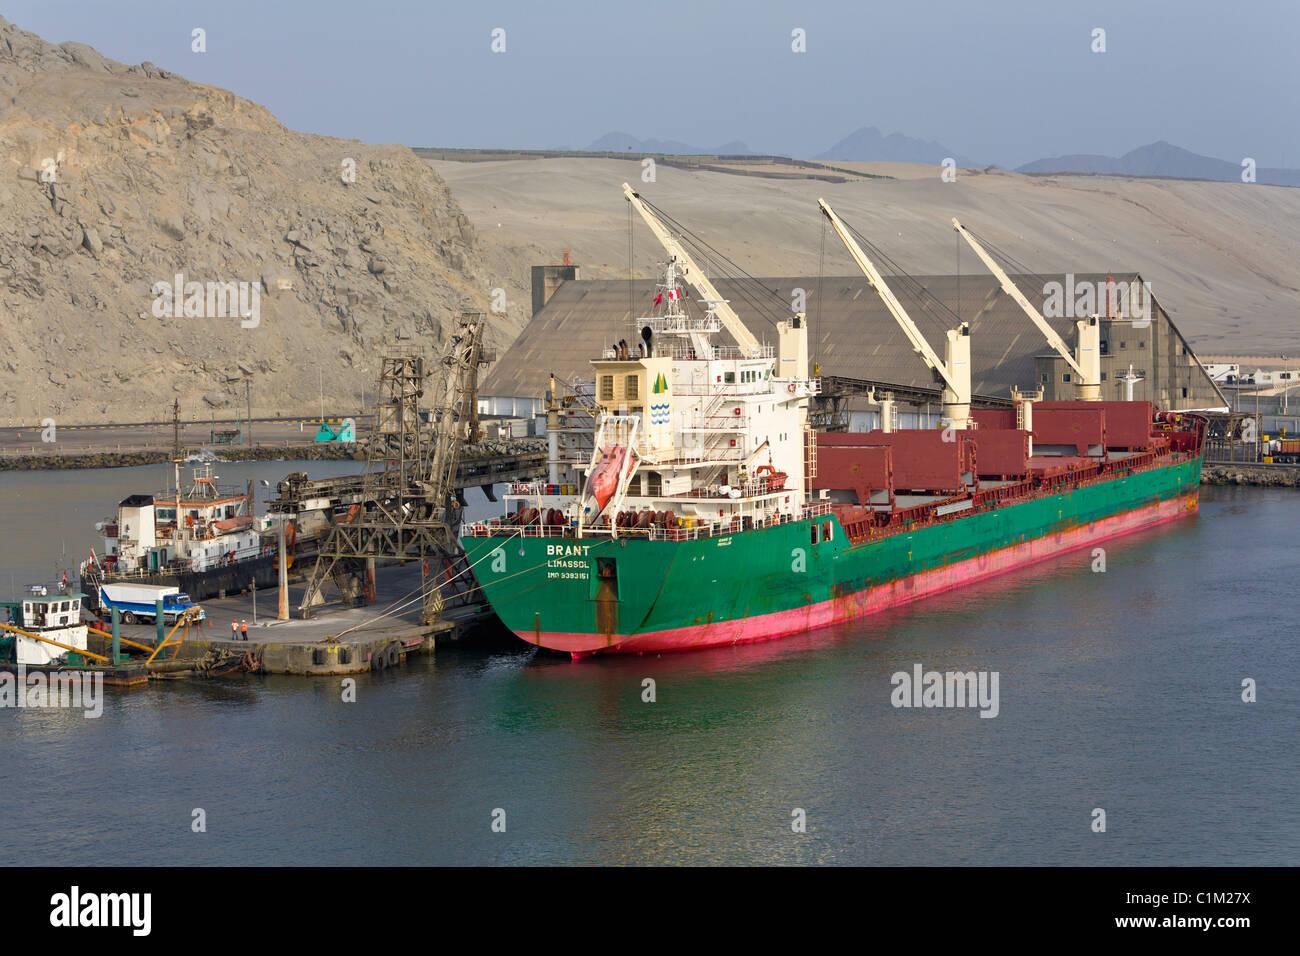 Cargo ship docked at the port of Salaverry, Trujillo, Peru Stock Photo